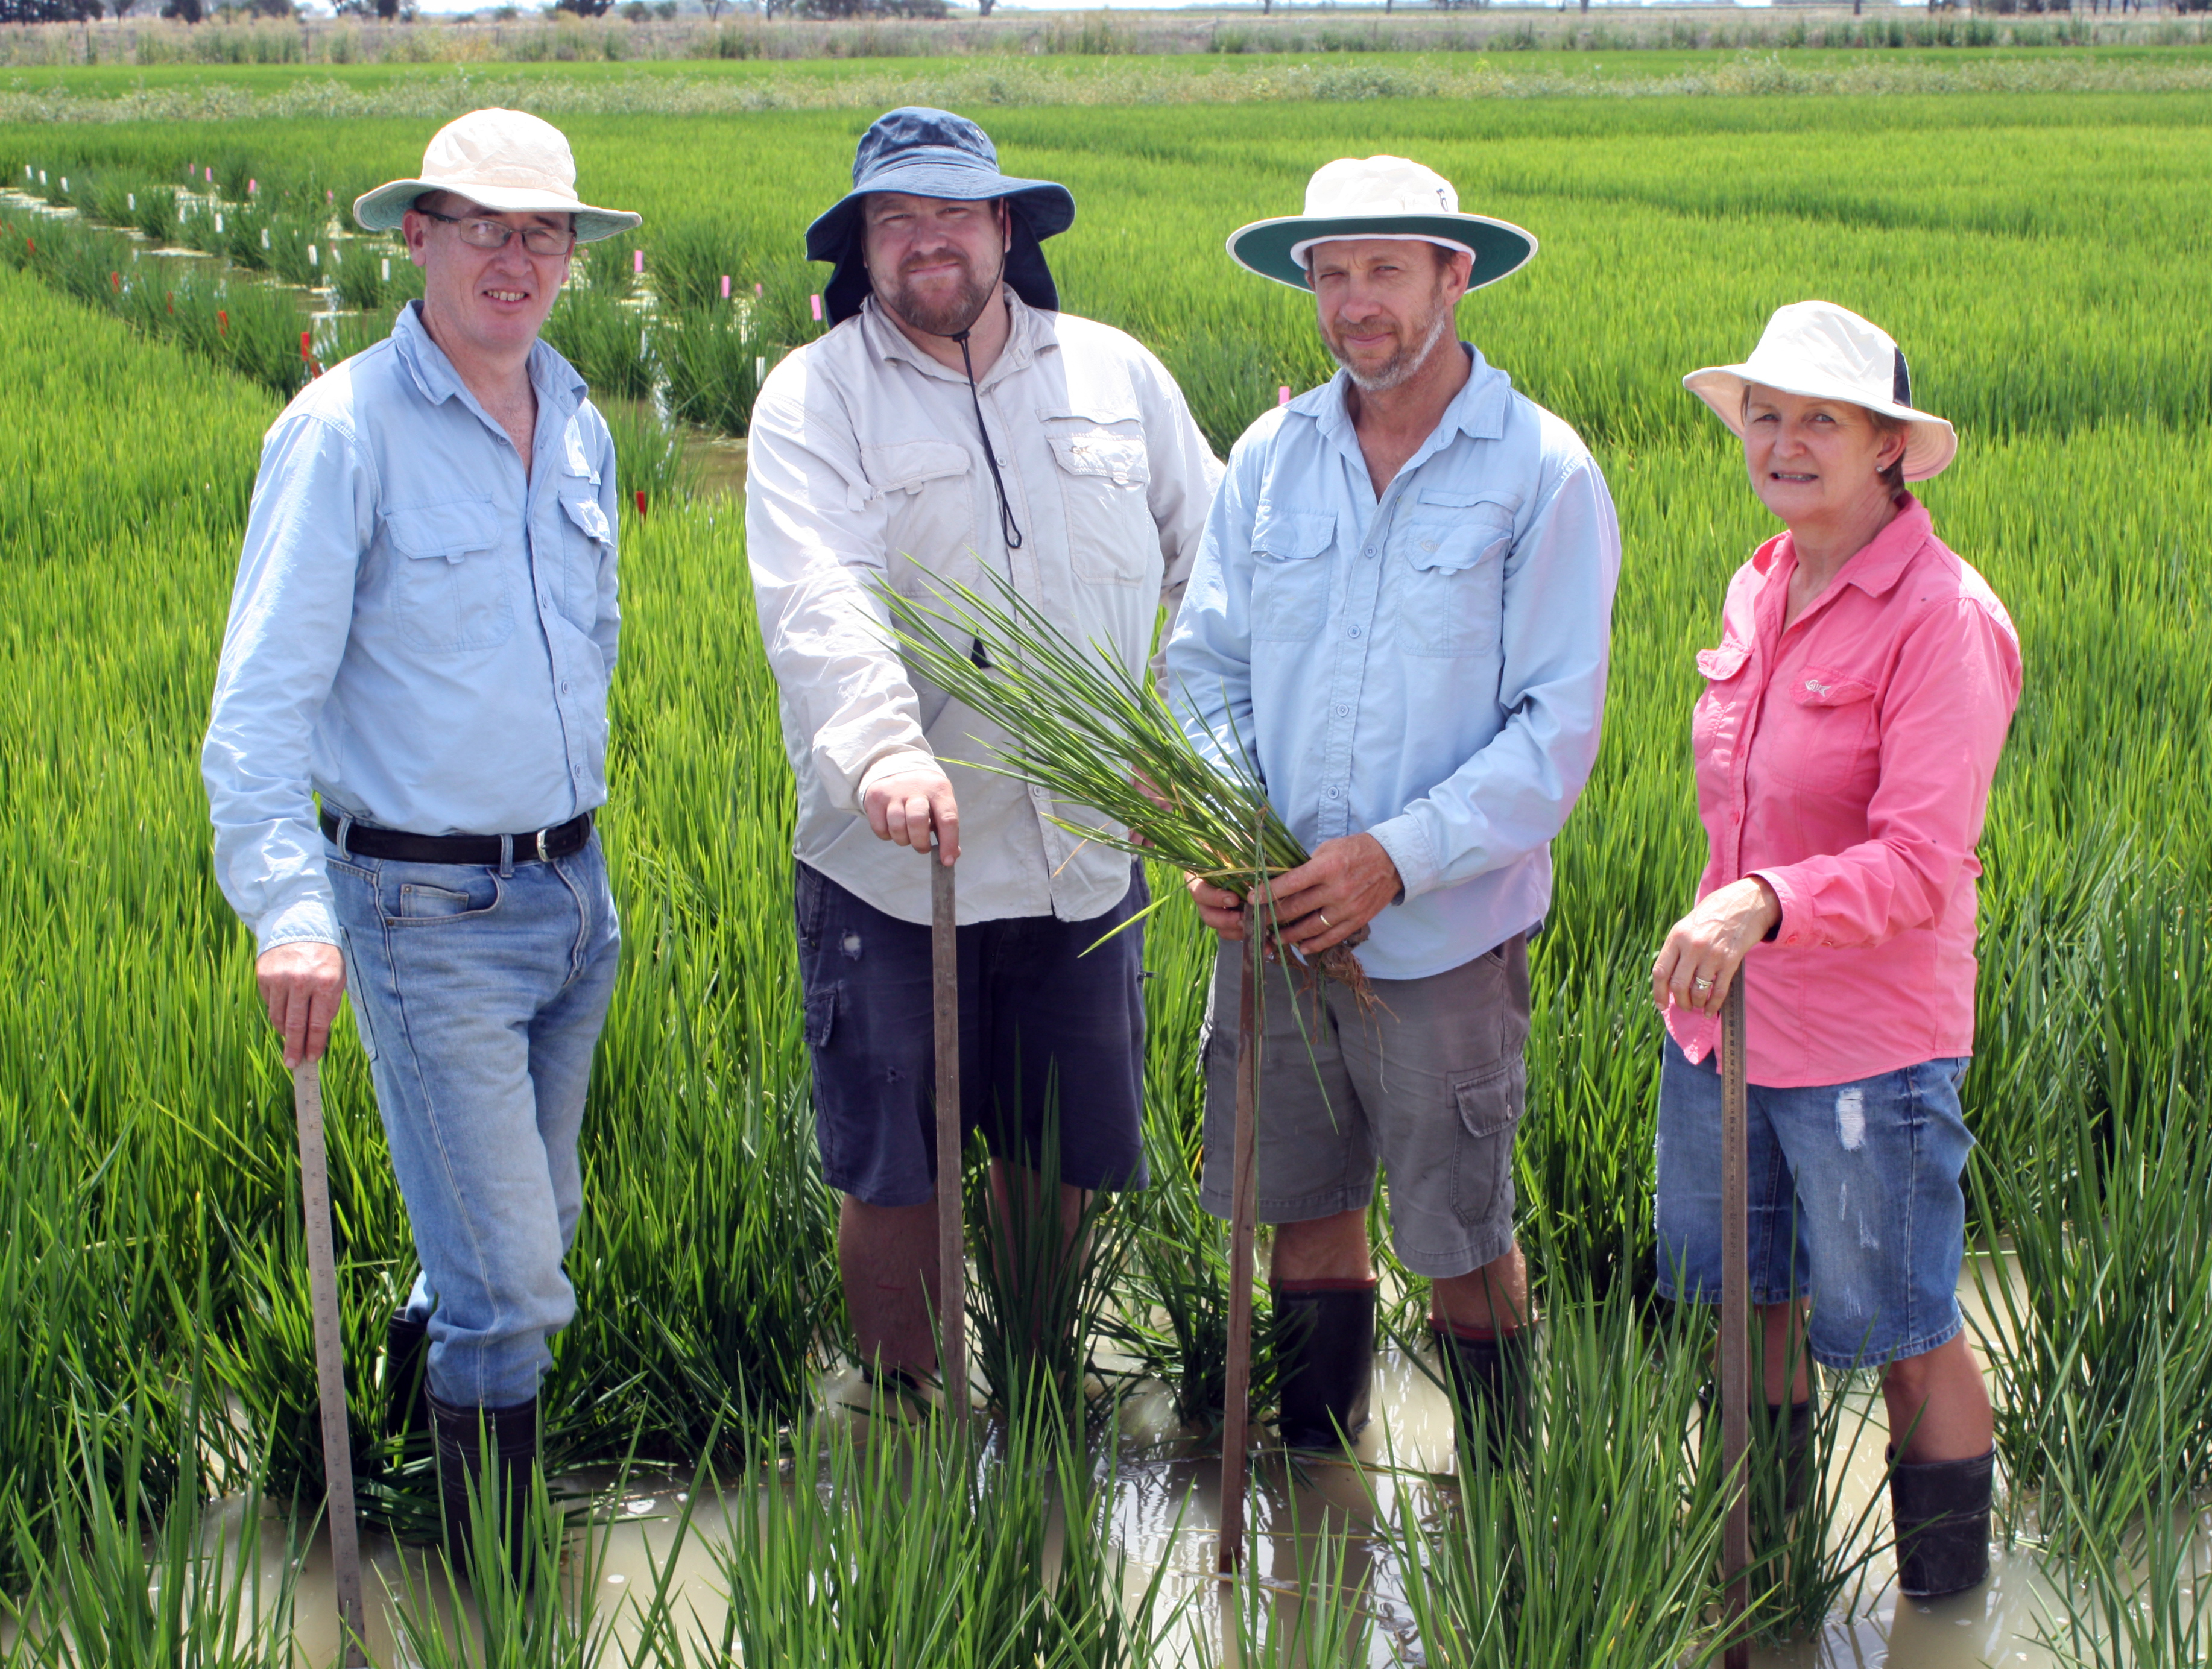 Chris Dawe, Craig Hodges, Brian Dunn and Tina Dunn standing in a rice field